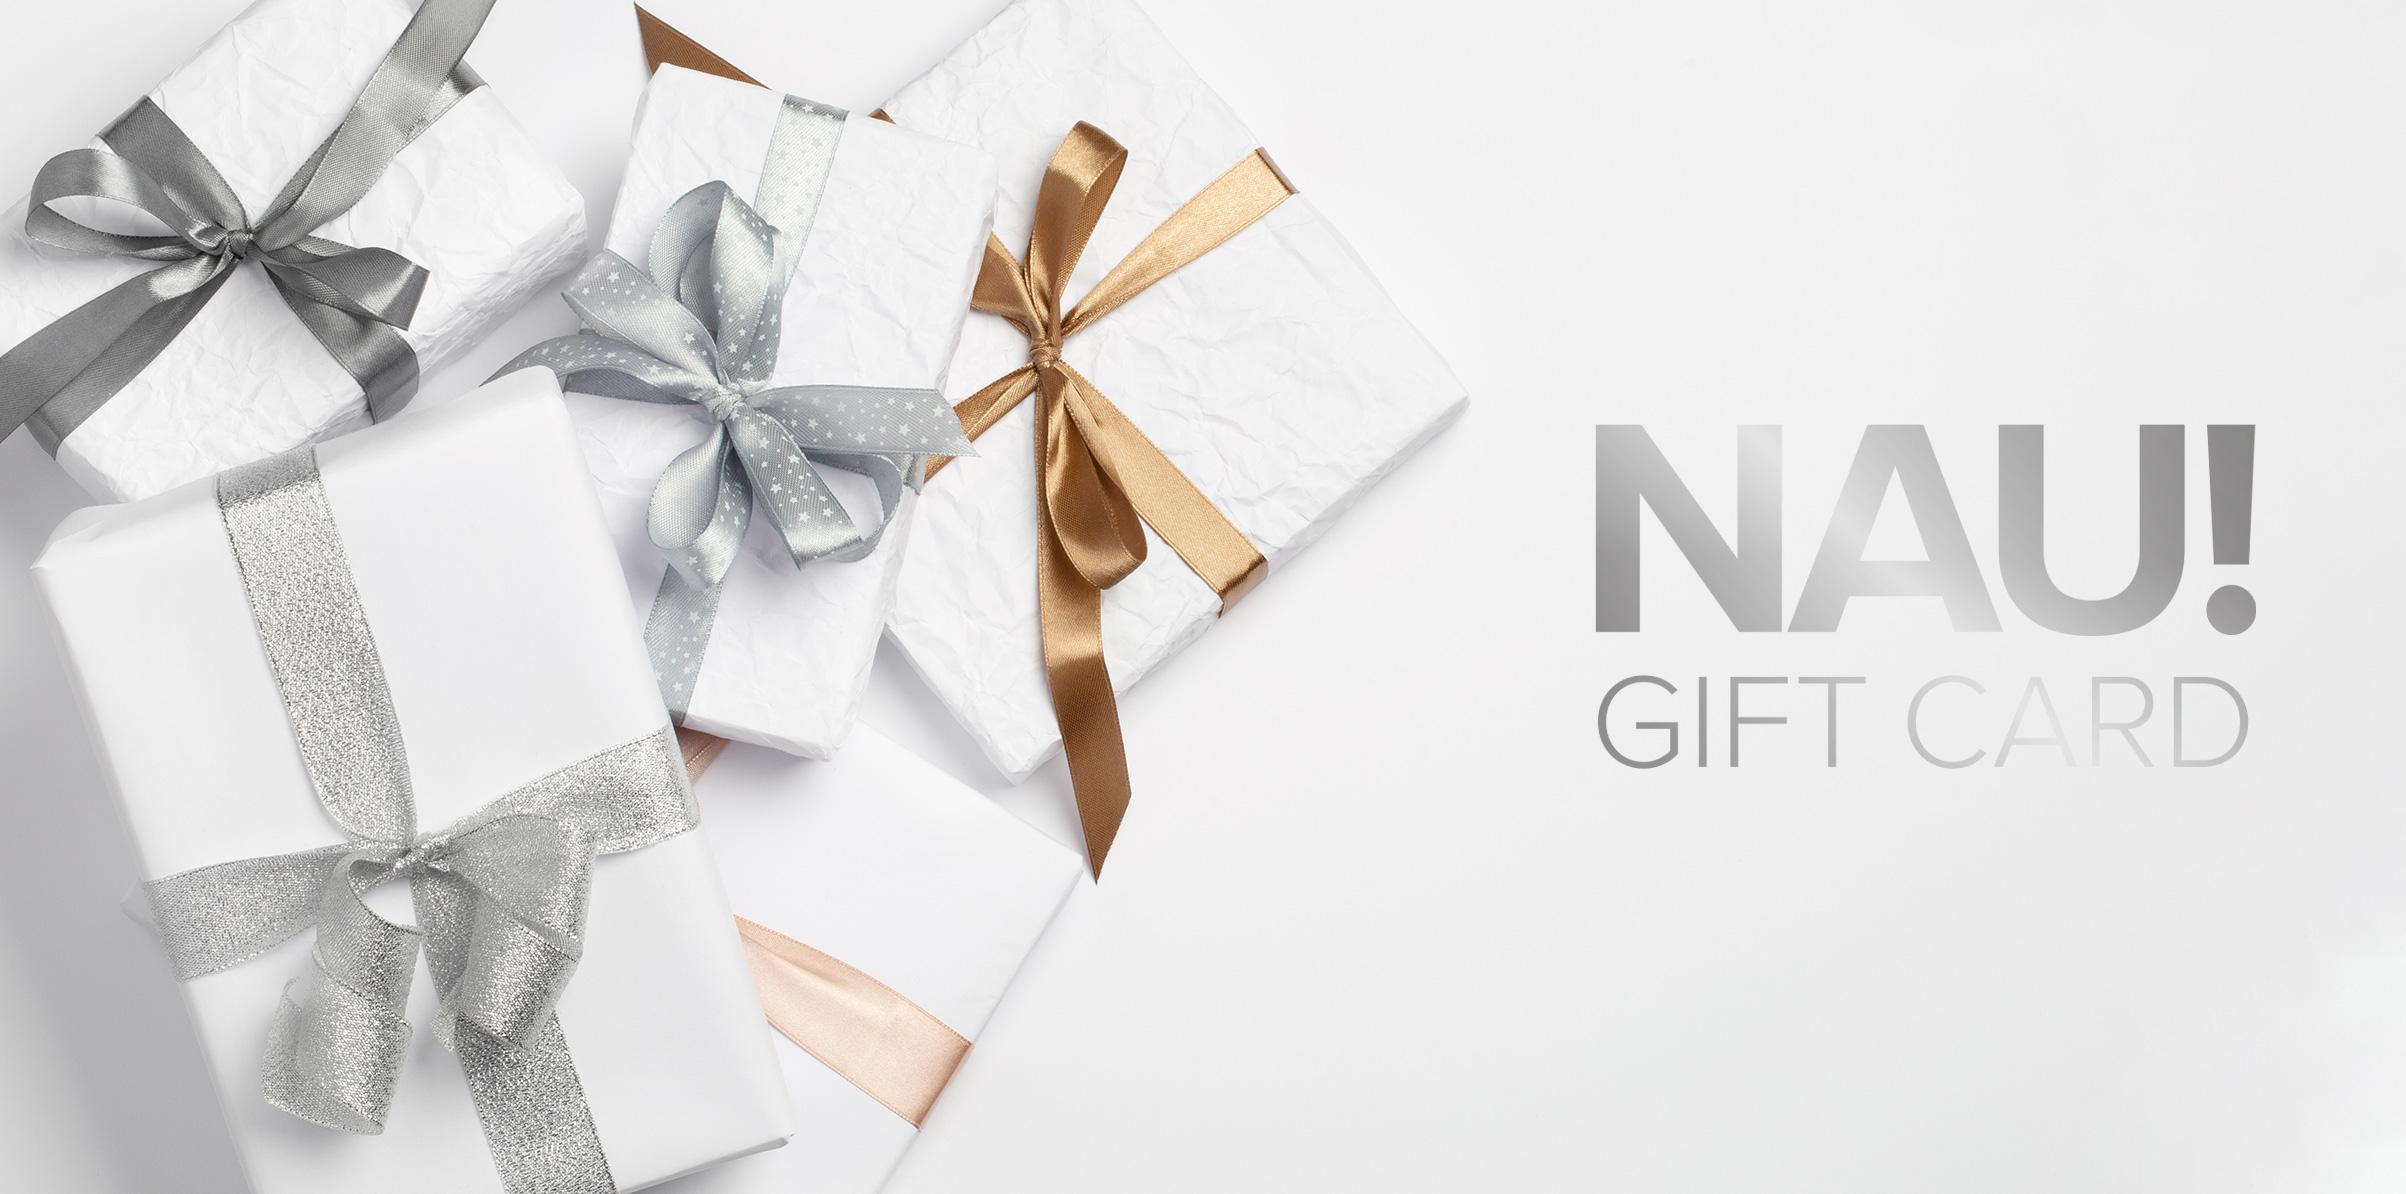 Gift card cartacea